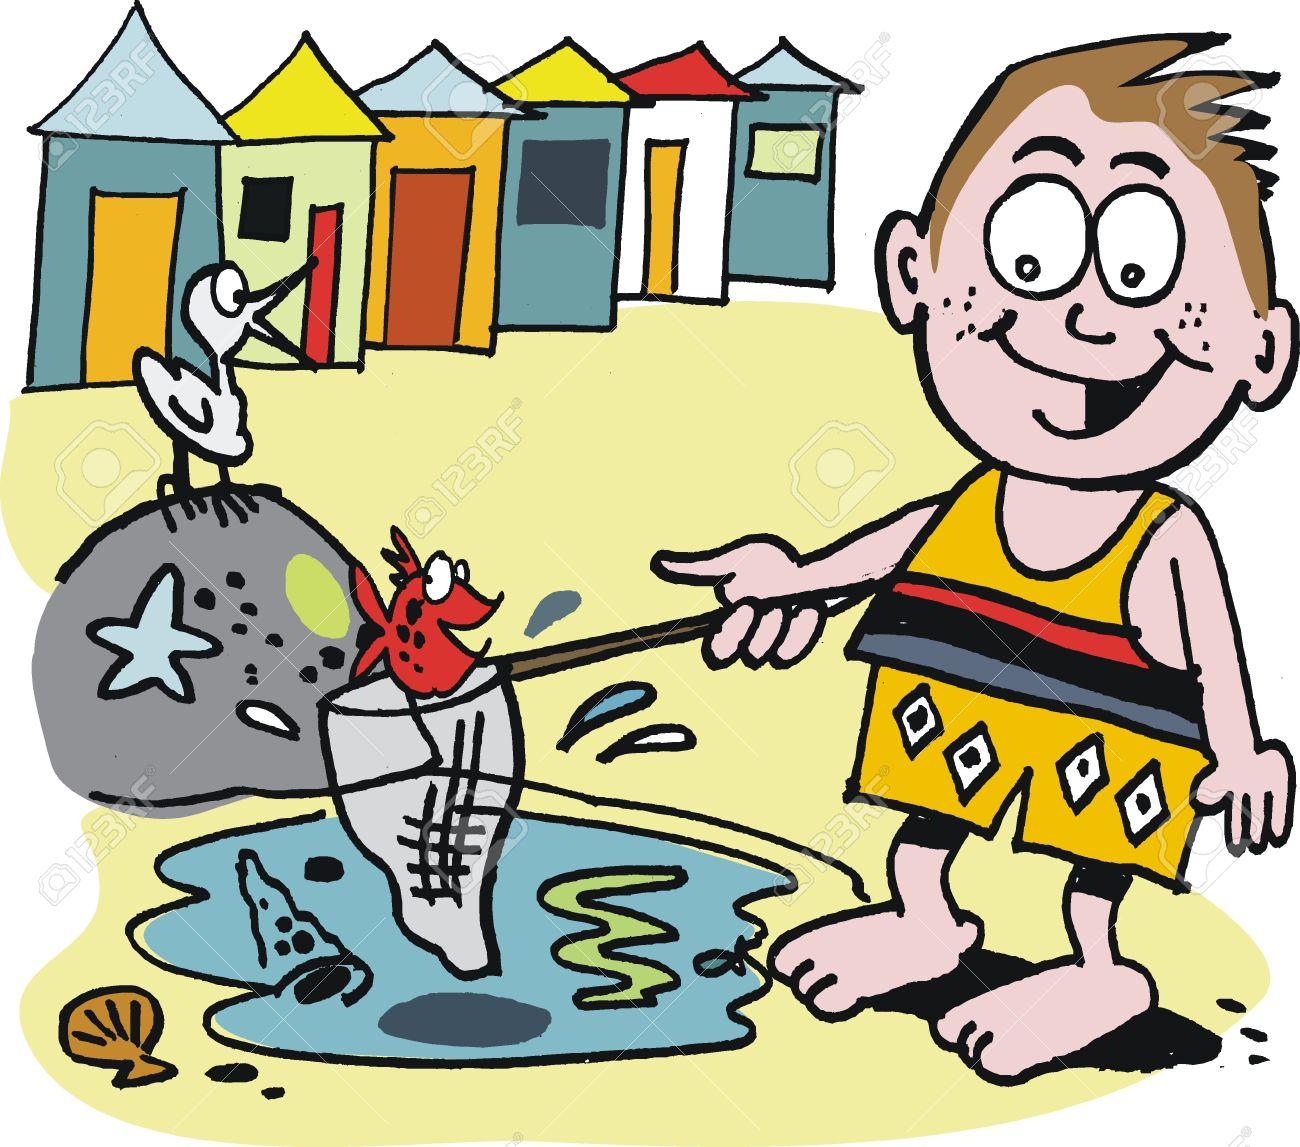 Cartoon Of Small Boy Fishing In Beach Rock Pool Royalty Free.